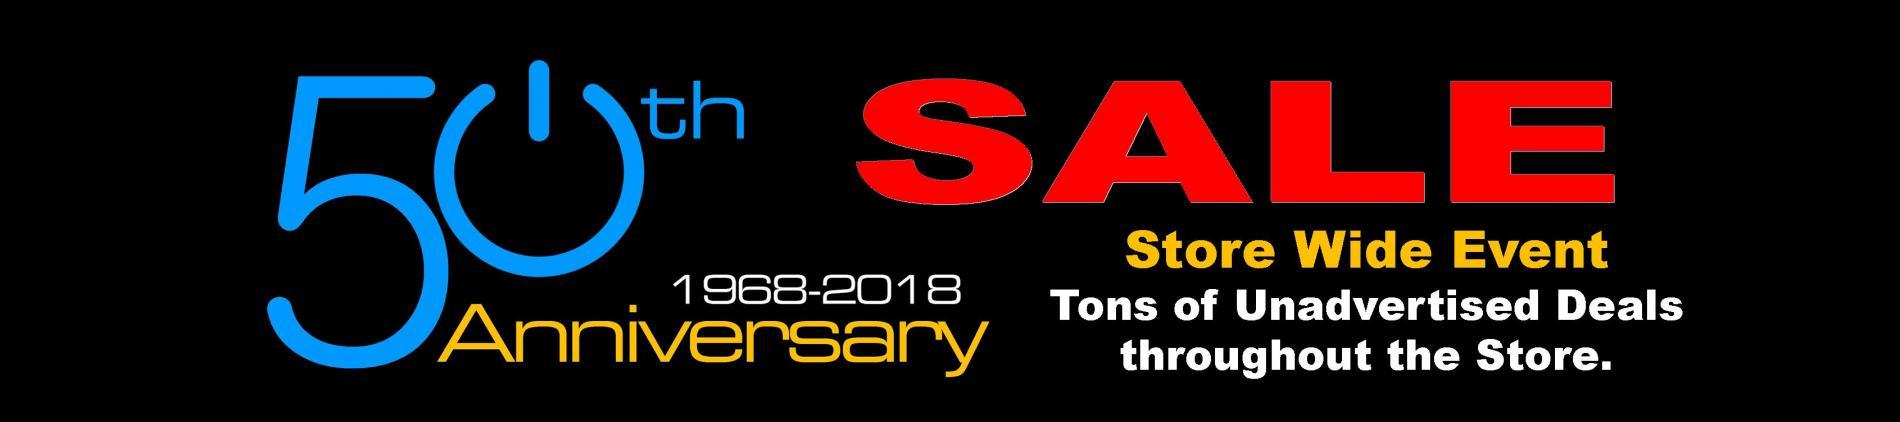 50th Anniversary Store Wide Sale